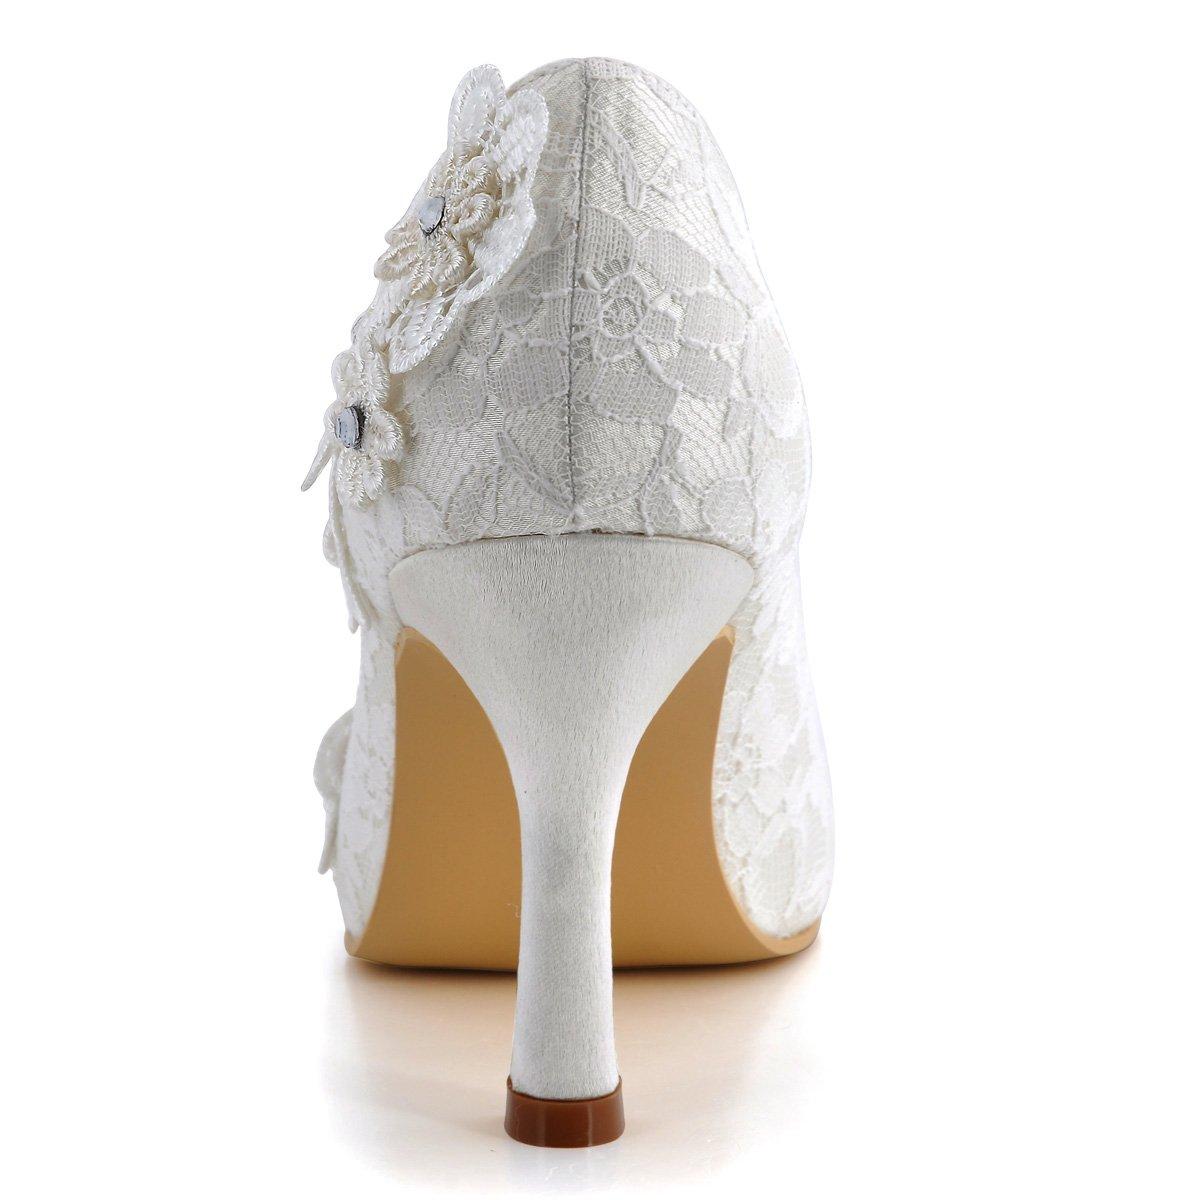 ElegantPark Women Vintage Closed Toe Pumps High Heel Flowers Lace Wedding Bridal Dress Shoes 2